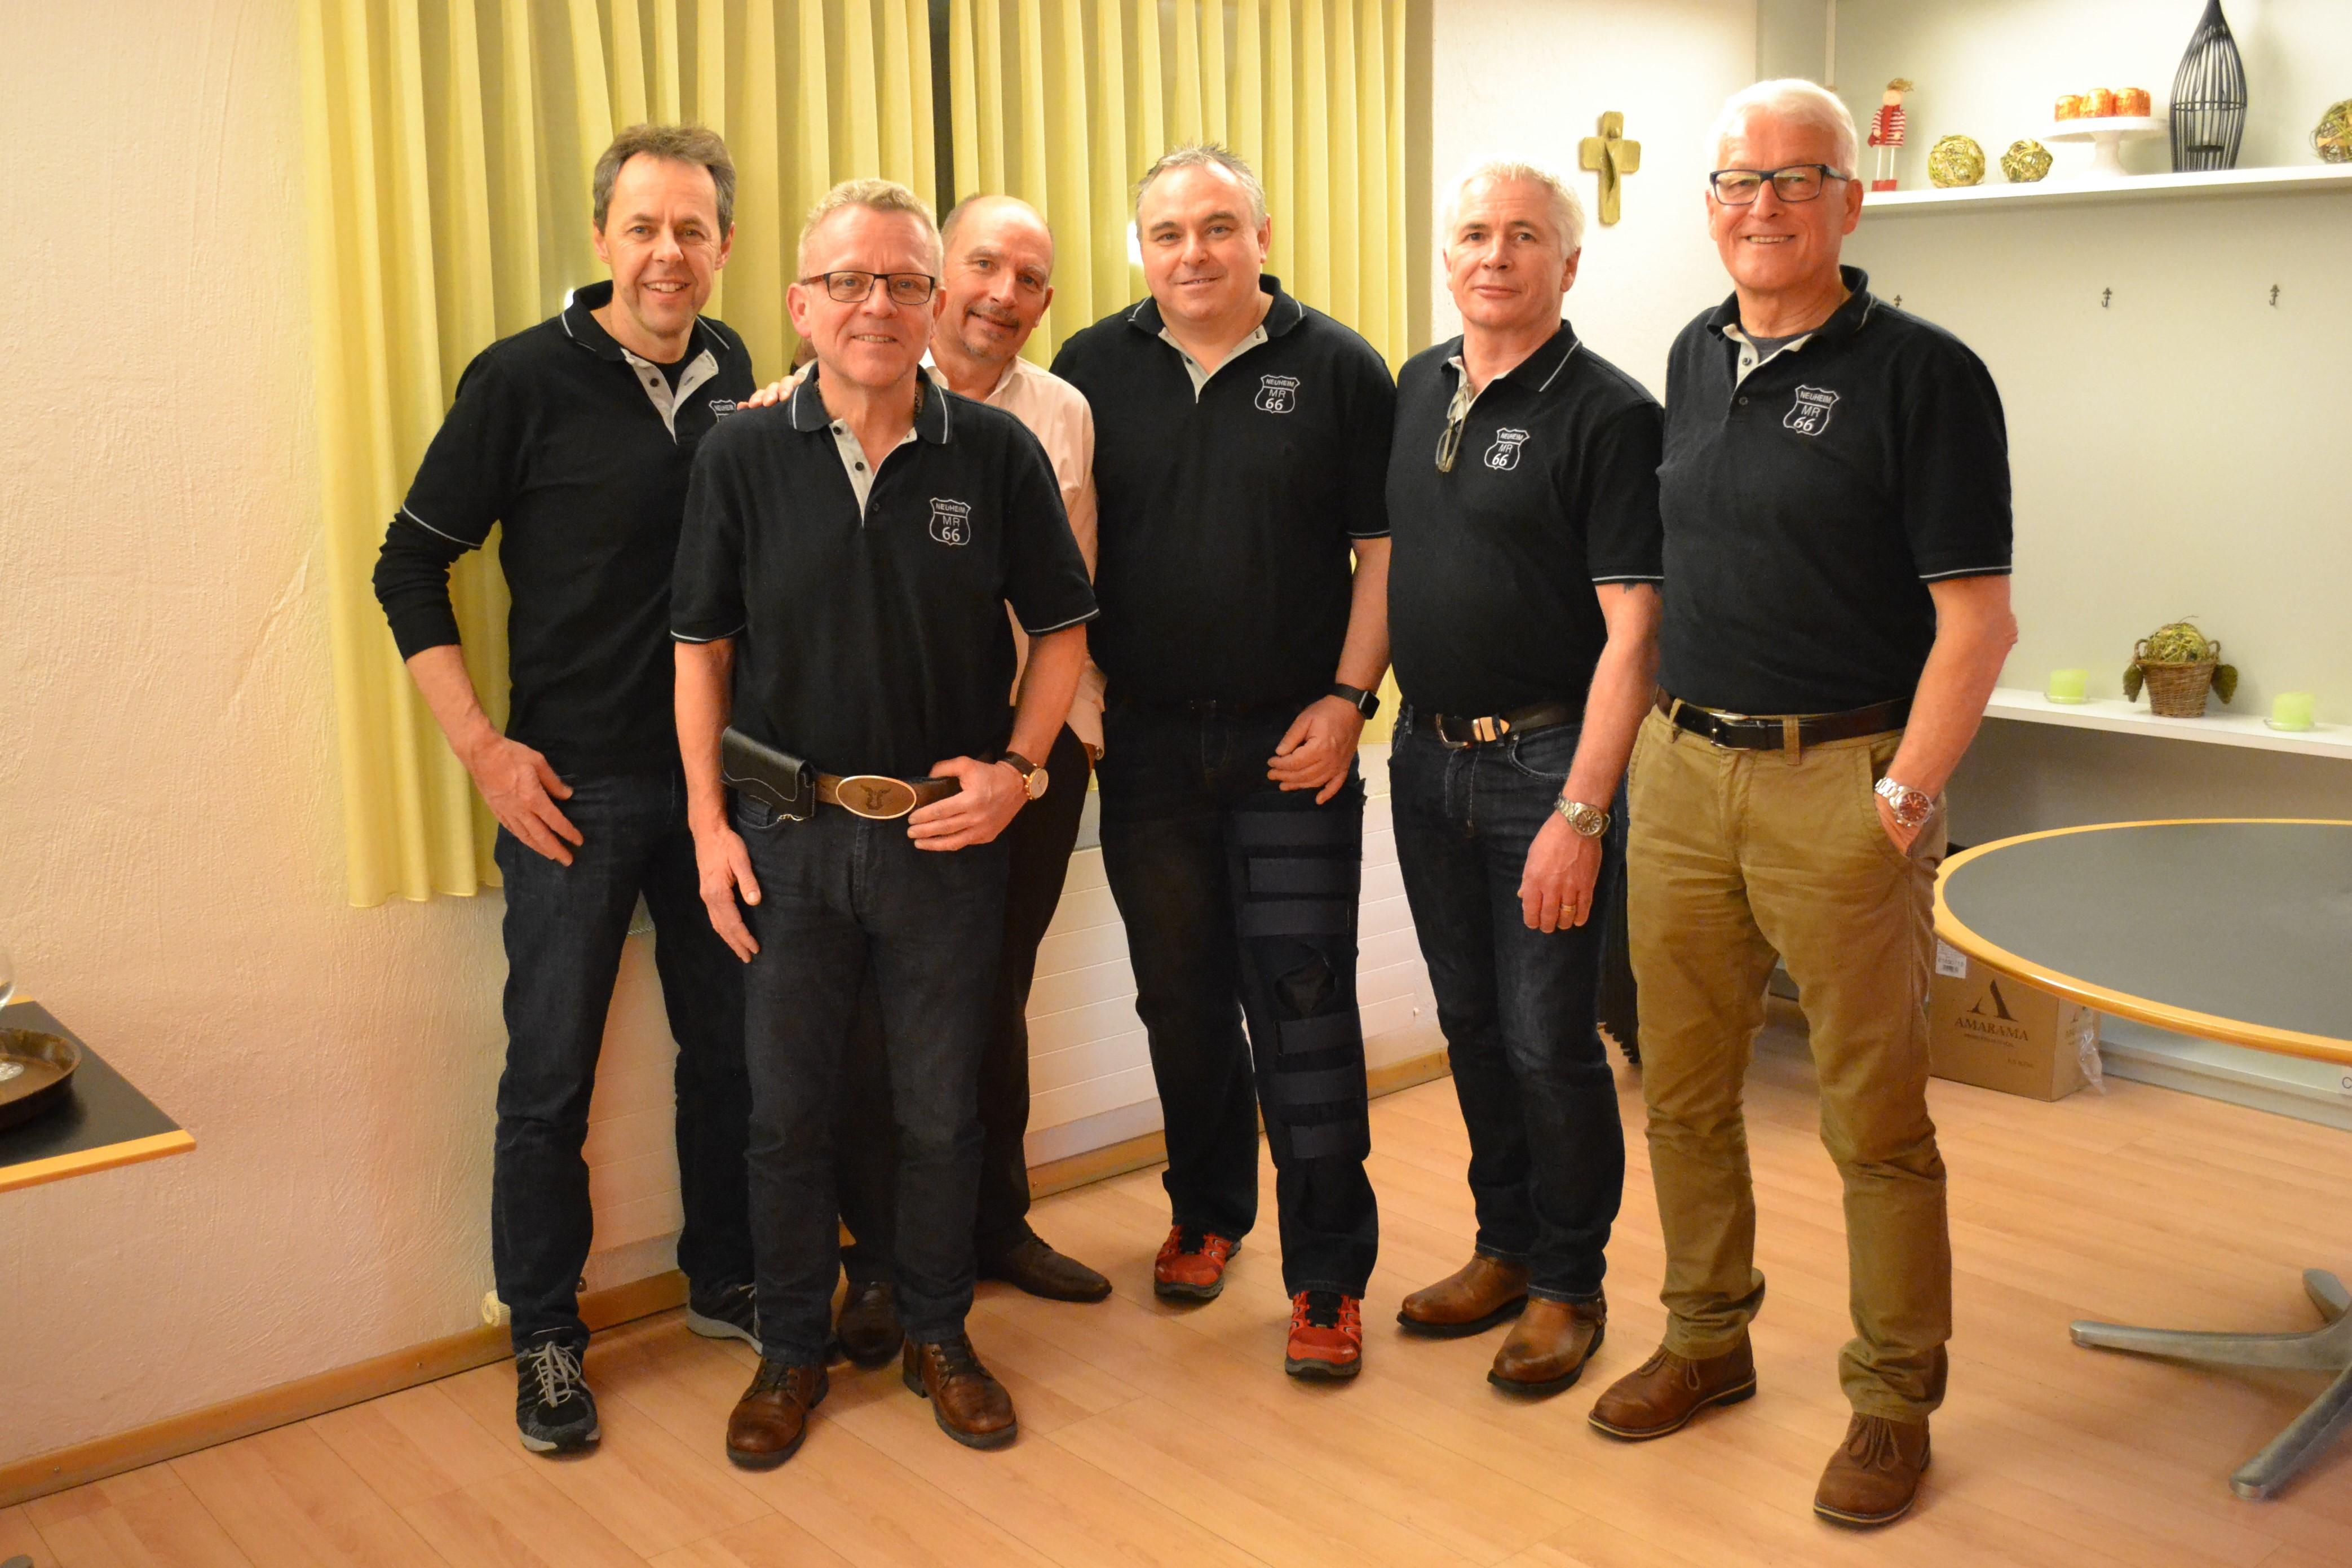 Vorstand der Männerriege Neuheim (v.l.): Harald Hirzel (Vizepräsident), Sepp Greter (Vizepräsident), Erhard Grosser (Kassier), Adi Feuchter (Präsident), Robert Halter (Beisitzer), Hugo Holdener (Aktuar und Sport)